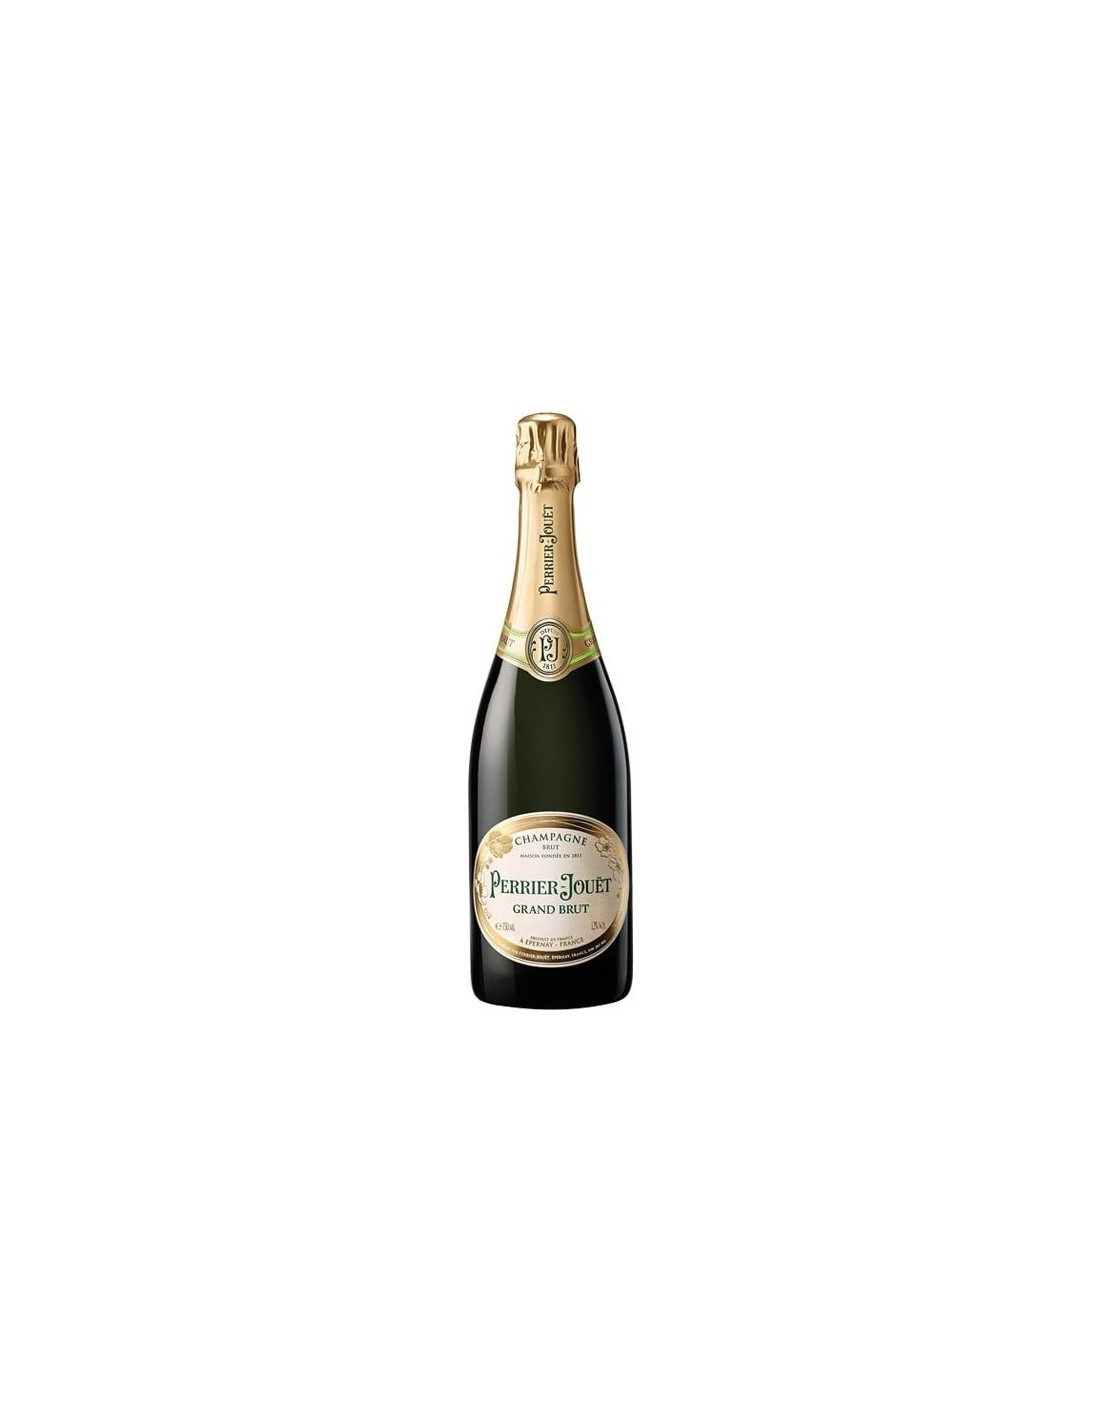 Sampanie, Perrier-Jouet Champagne, 0.75L, 12% alc., Franta